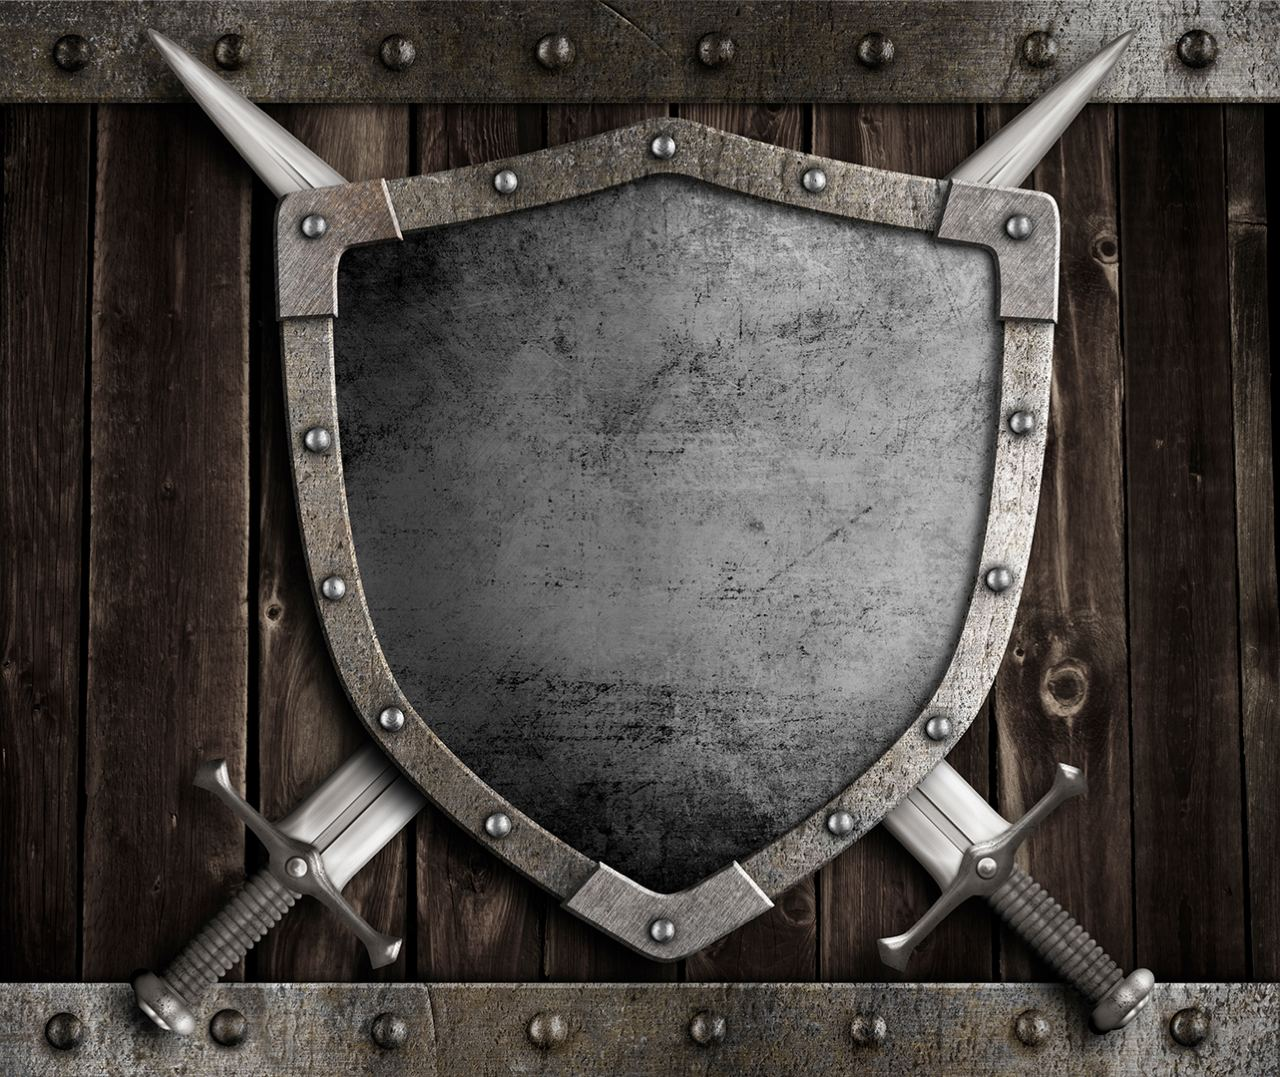 Defenderse de los ataques espirituales1 min read